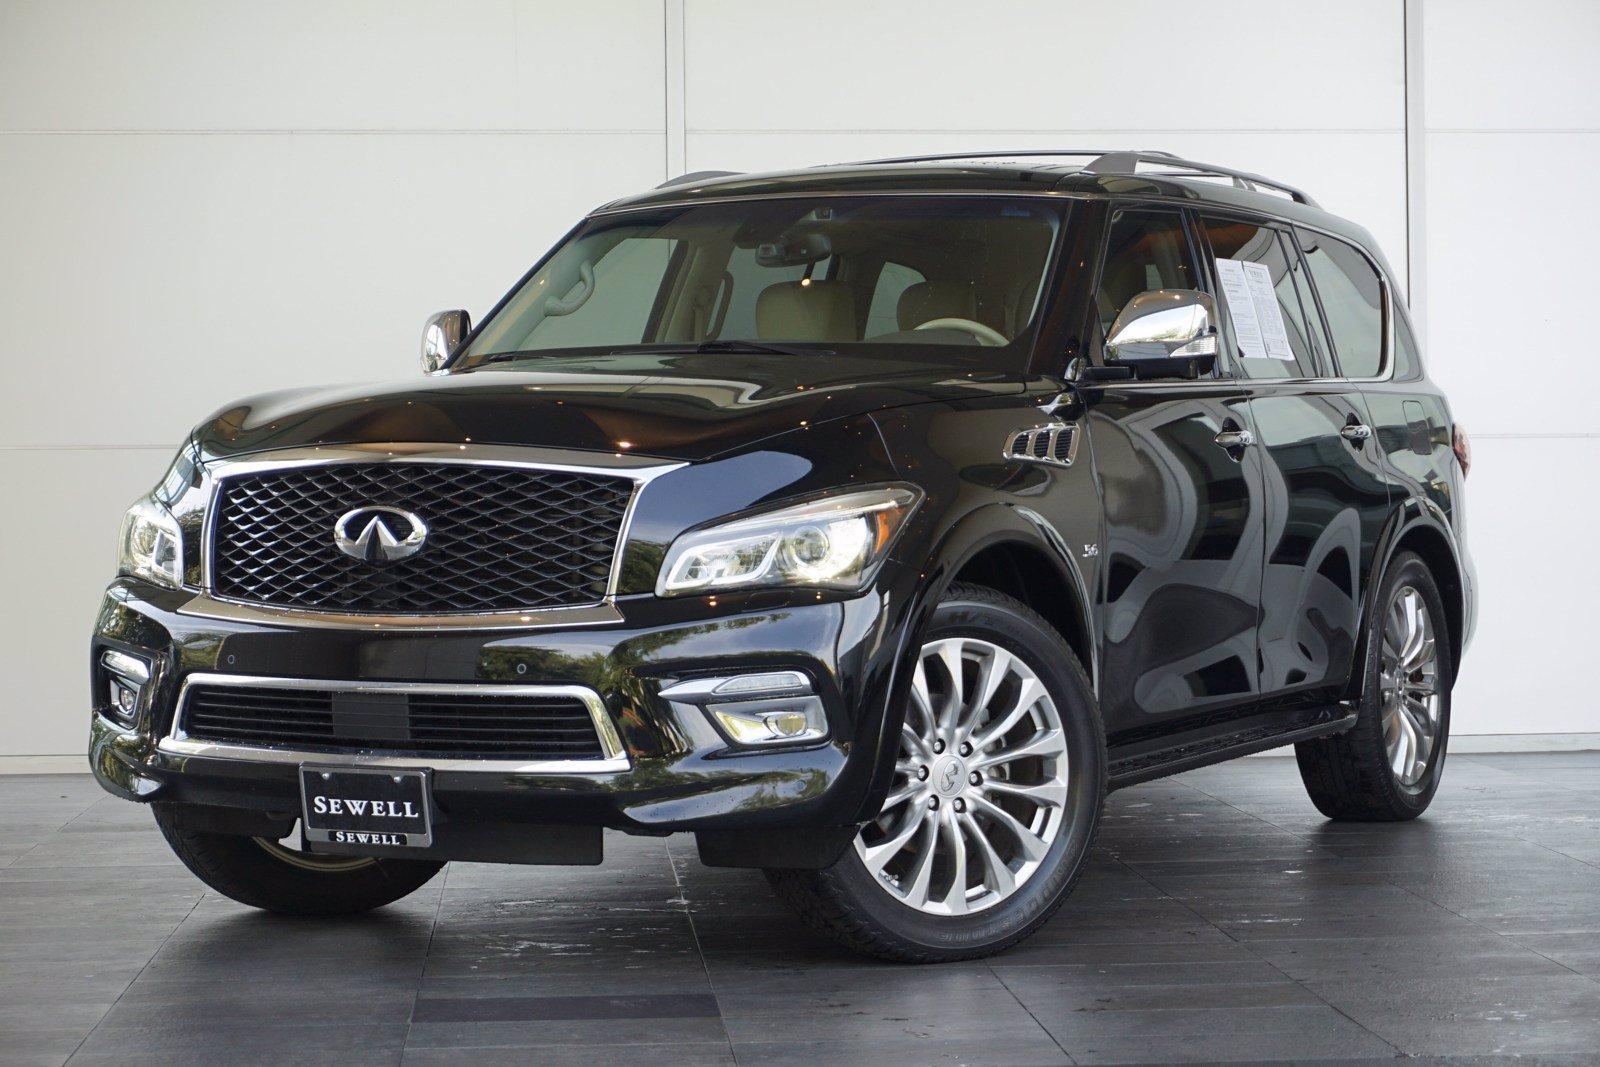 2016 INFINITI QX80 Vehicle Photo in Houston, TX 77079